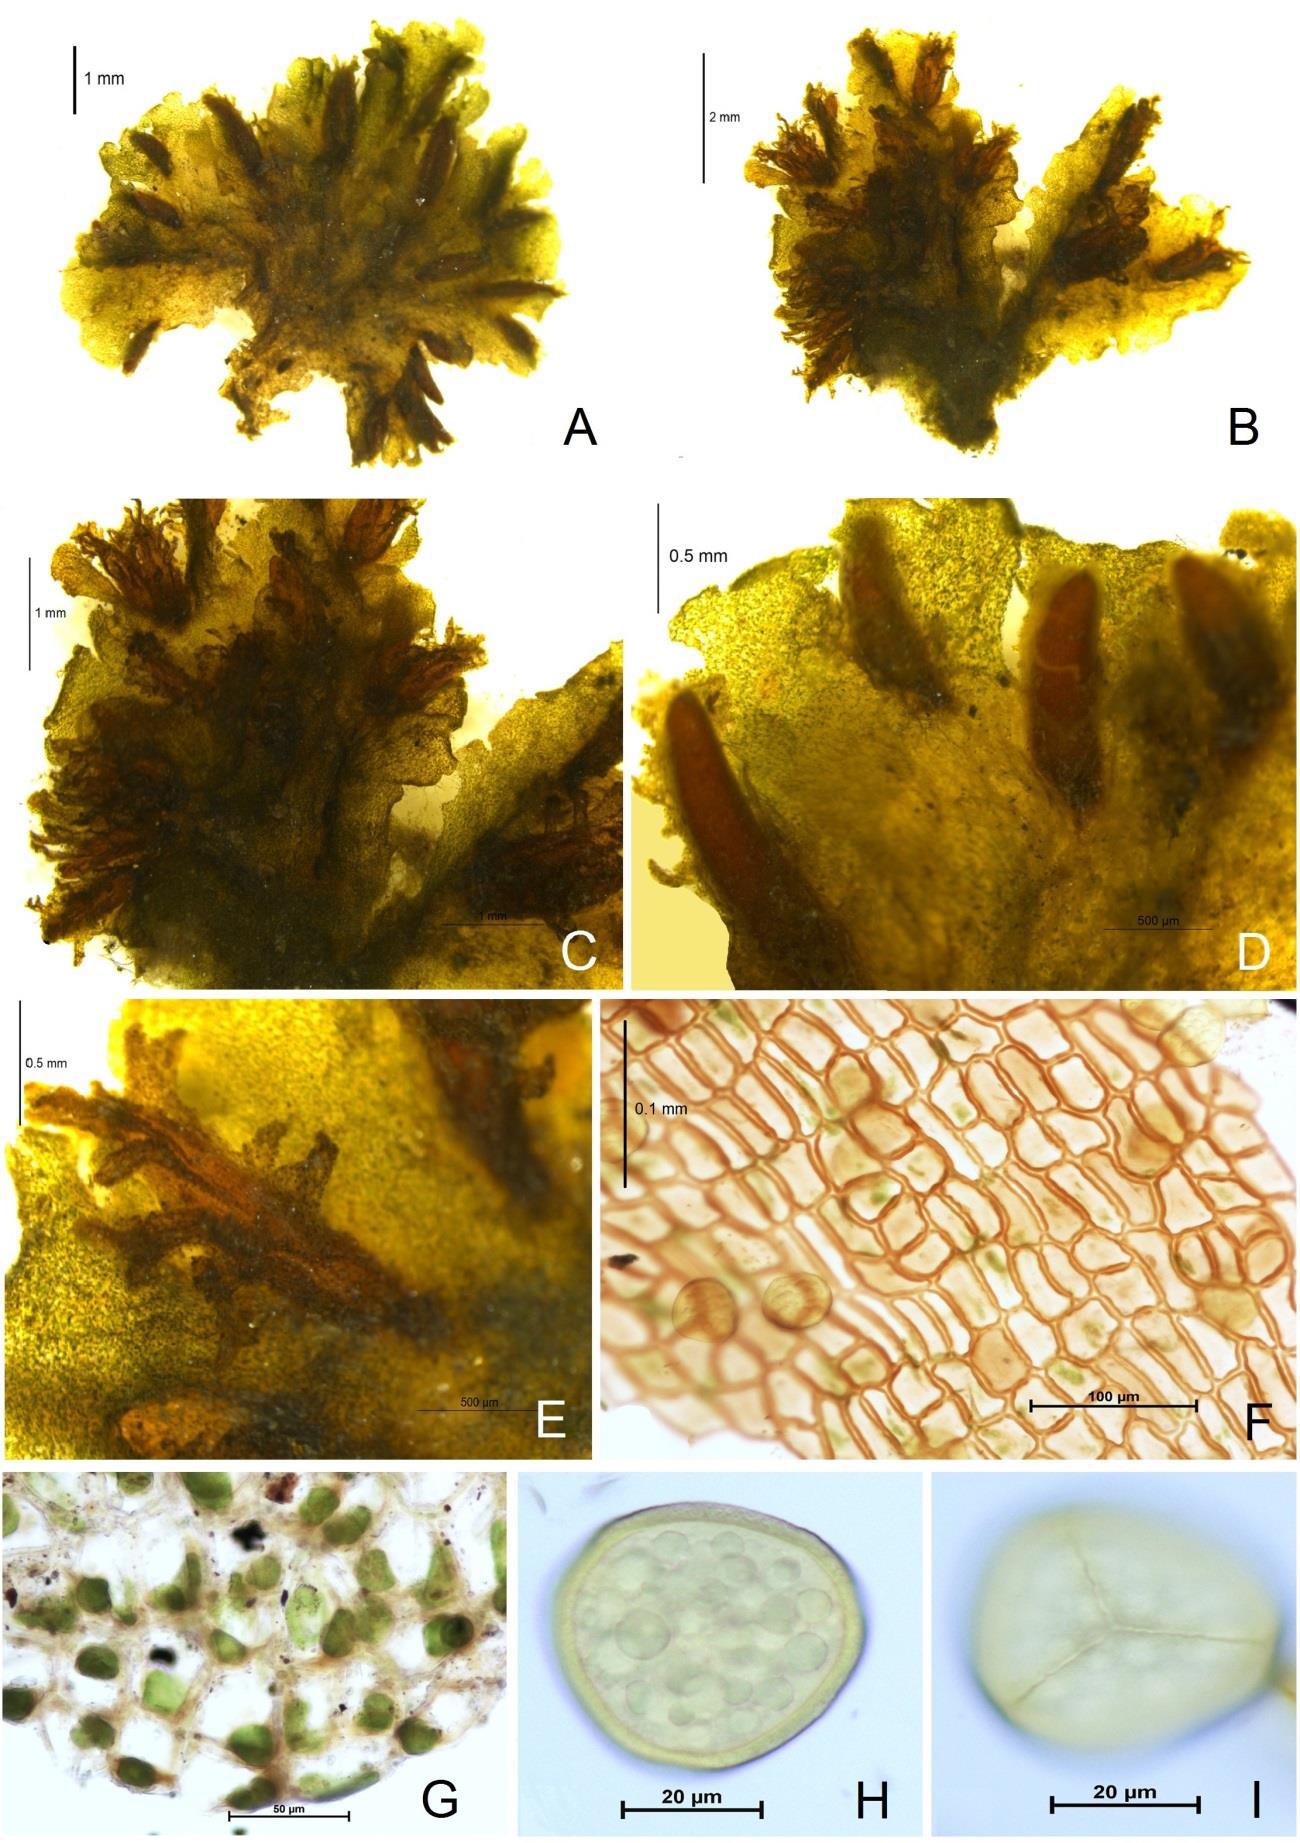 Notothylas kashyapii: A–C, Thalli; D, Sporophytes in the apical region; E, Lamellae present on involucres; F, Capsule wall; G, chloroplast; H–I, Spores.